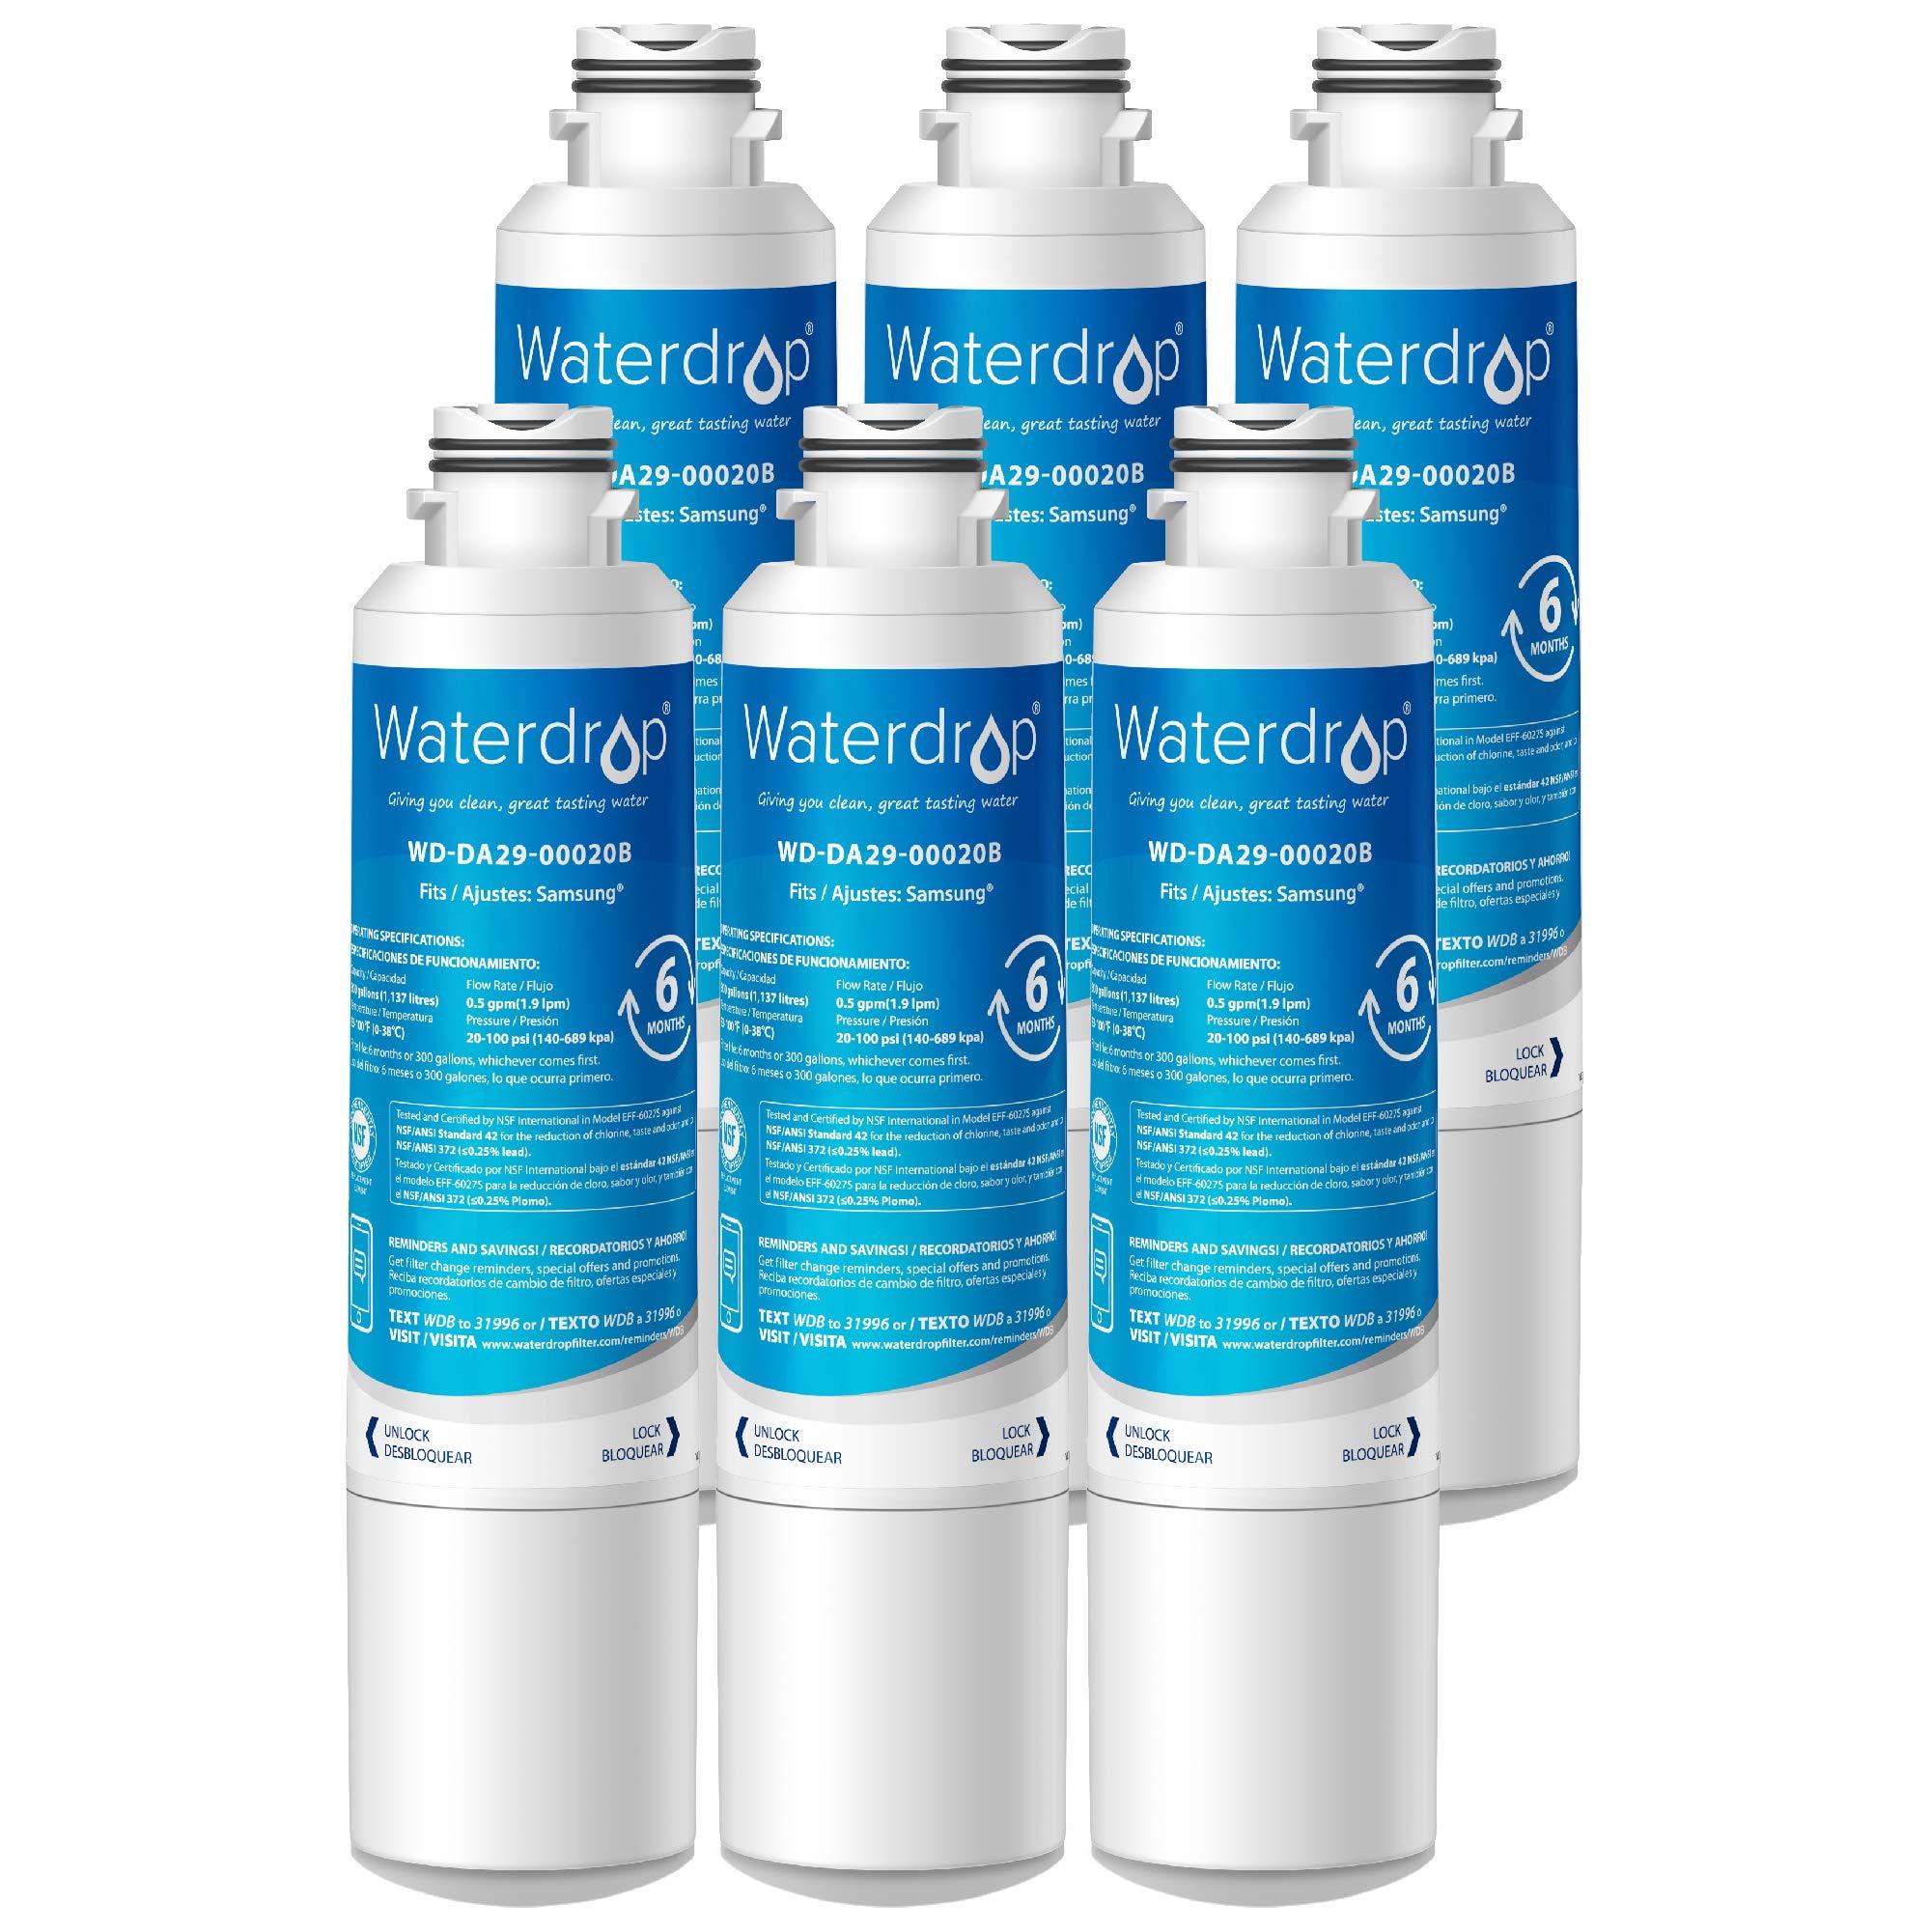 Waterdrop DA29-00020B Refrigerator Water Filter, Compatible with Samsung DA29-00020B, DA29-00020A, HAF-CIN/EXP, 46-9101, Standard, Pack of 6 by Waterdrop